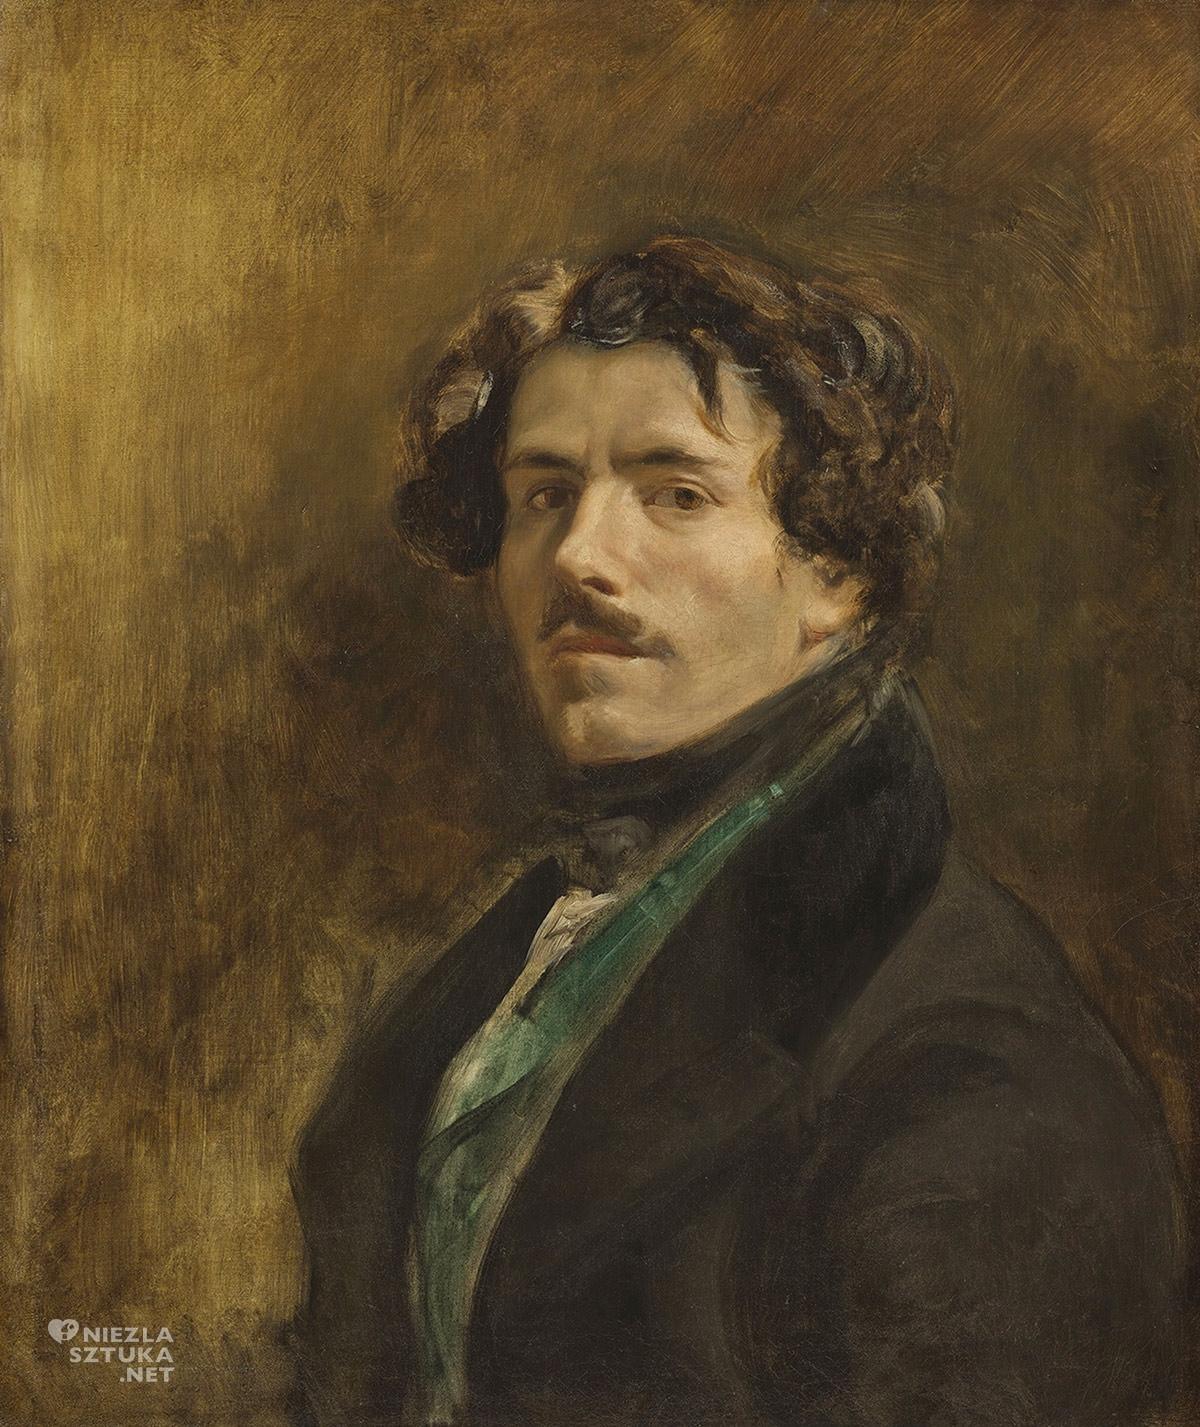 Eugène Delacroix, Autoportret, Luwr, Paryż, Niezła sztuka